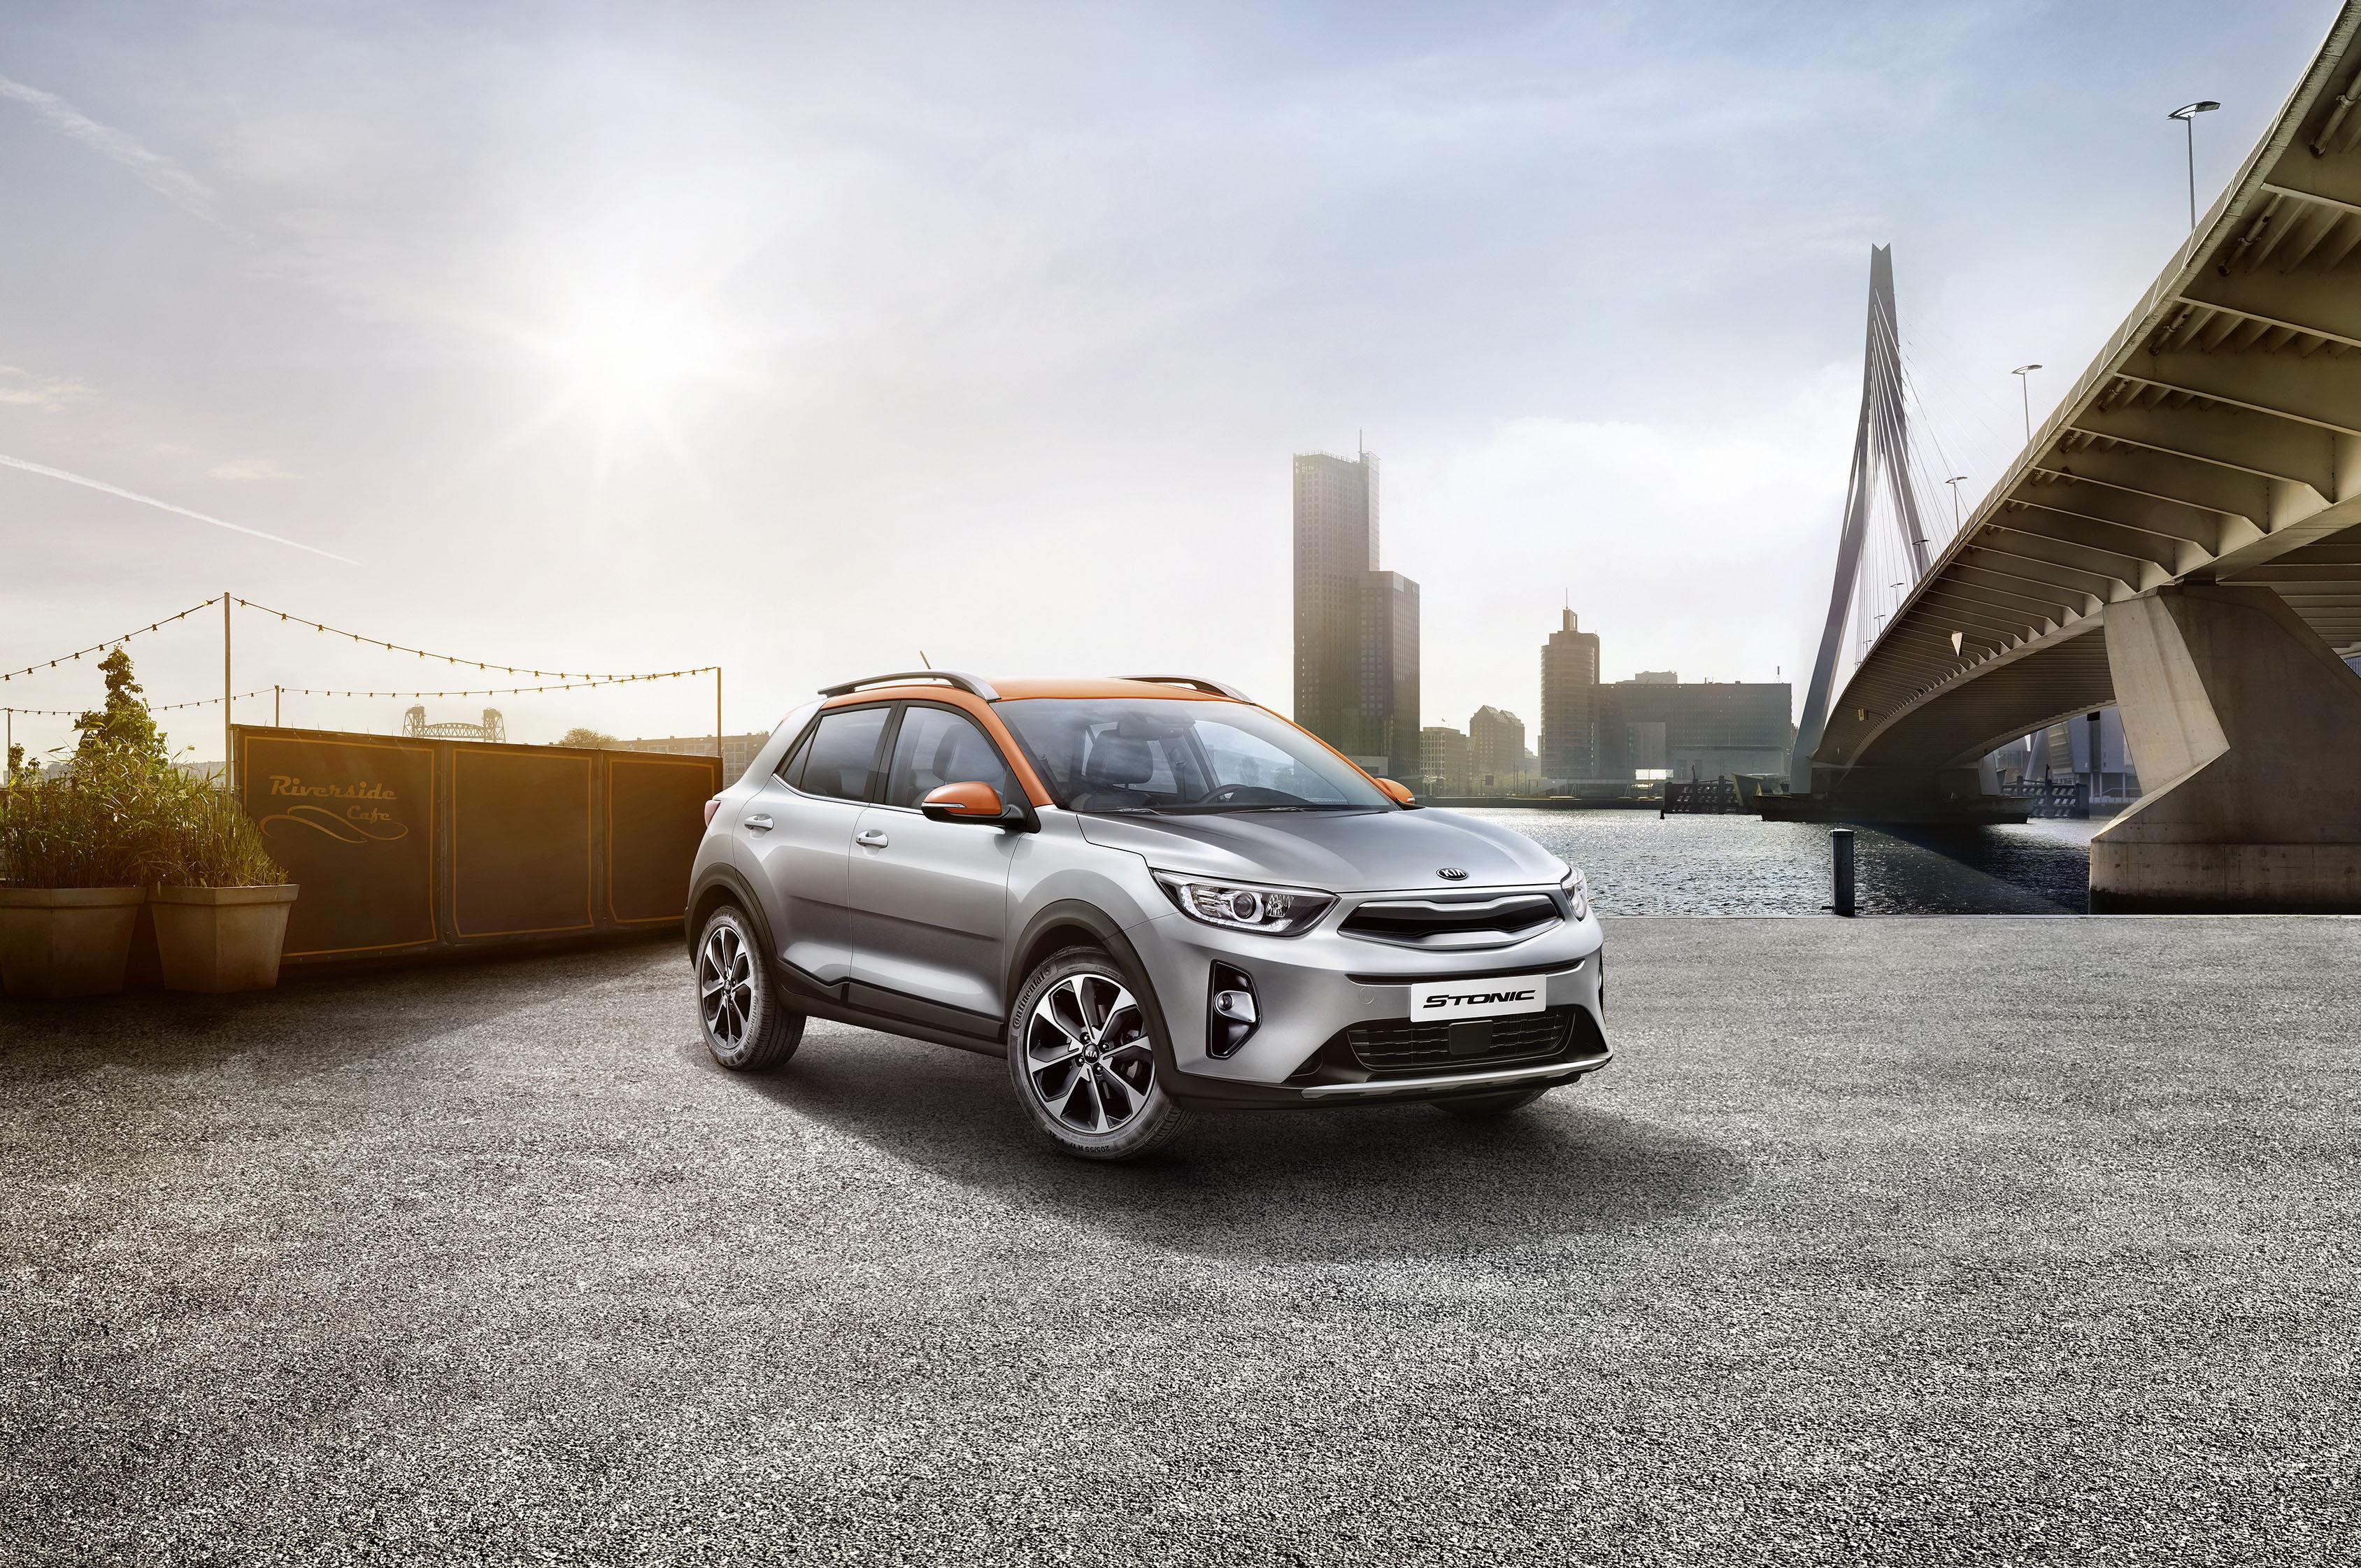 Kia Stonic Debuts For Europe Automobile Magazine Motor Satria 120 R 1 13